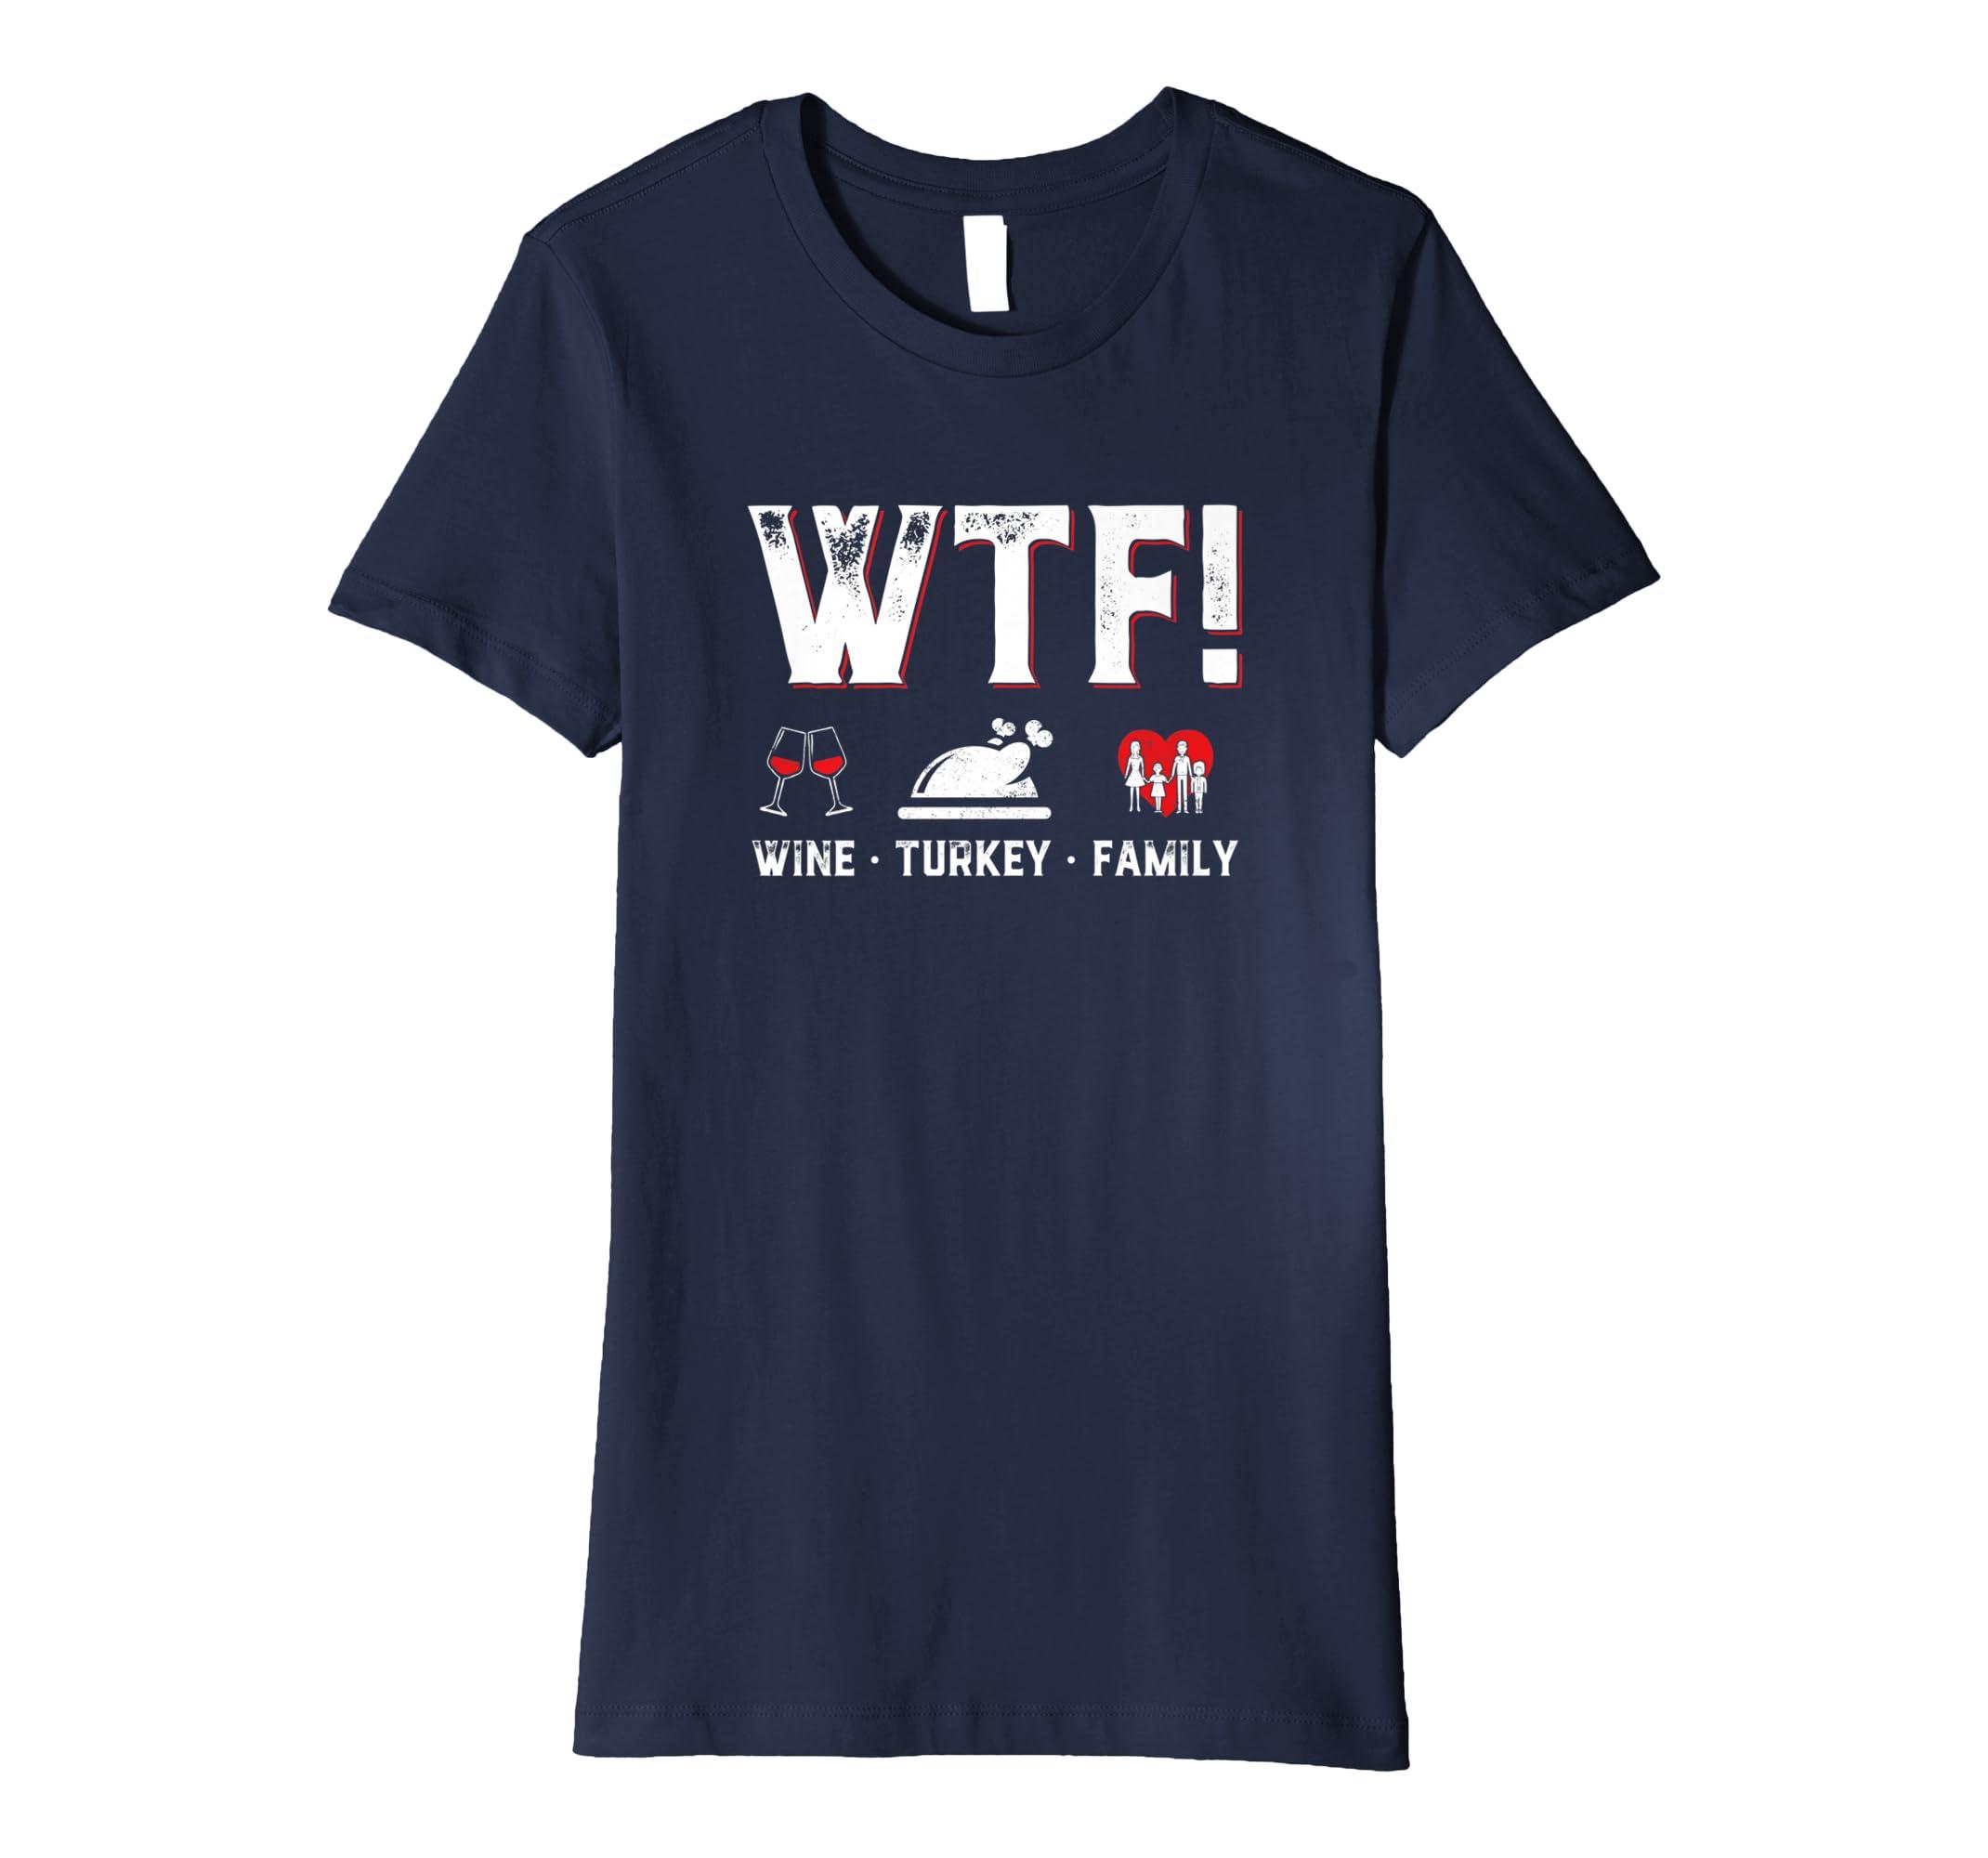 e879e675 Amazon.com: WTF Wine Turkey Family Shirt Funny Thanksgiving Day T-Shirt:  Clothing